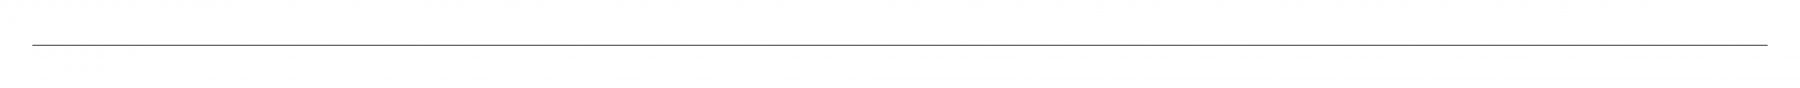 thin line 1 pt-c